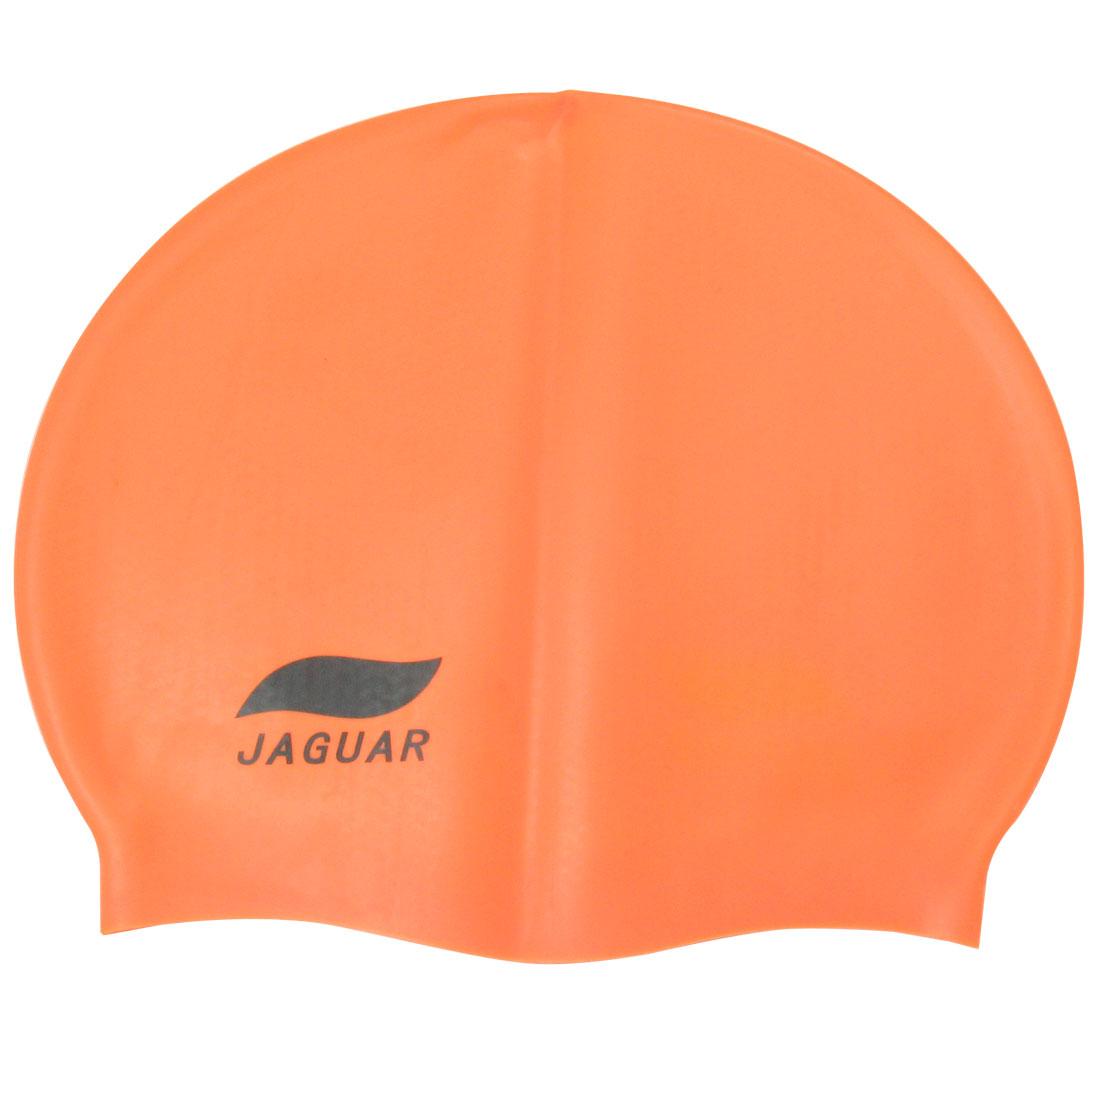 Orange Flexible Swimmer Thin Skin Silicone Swimming Cap